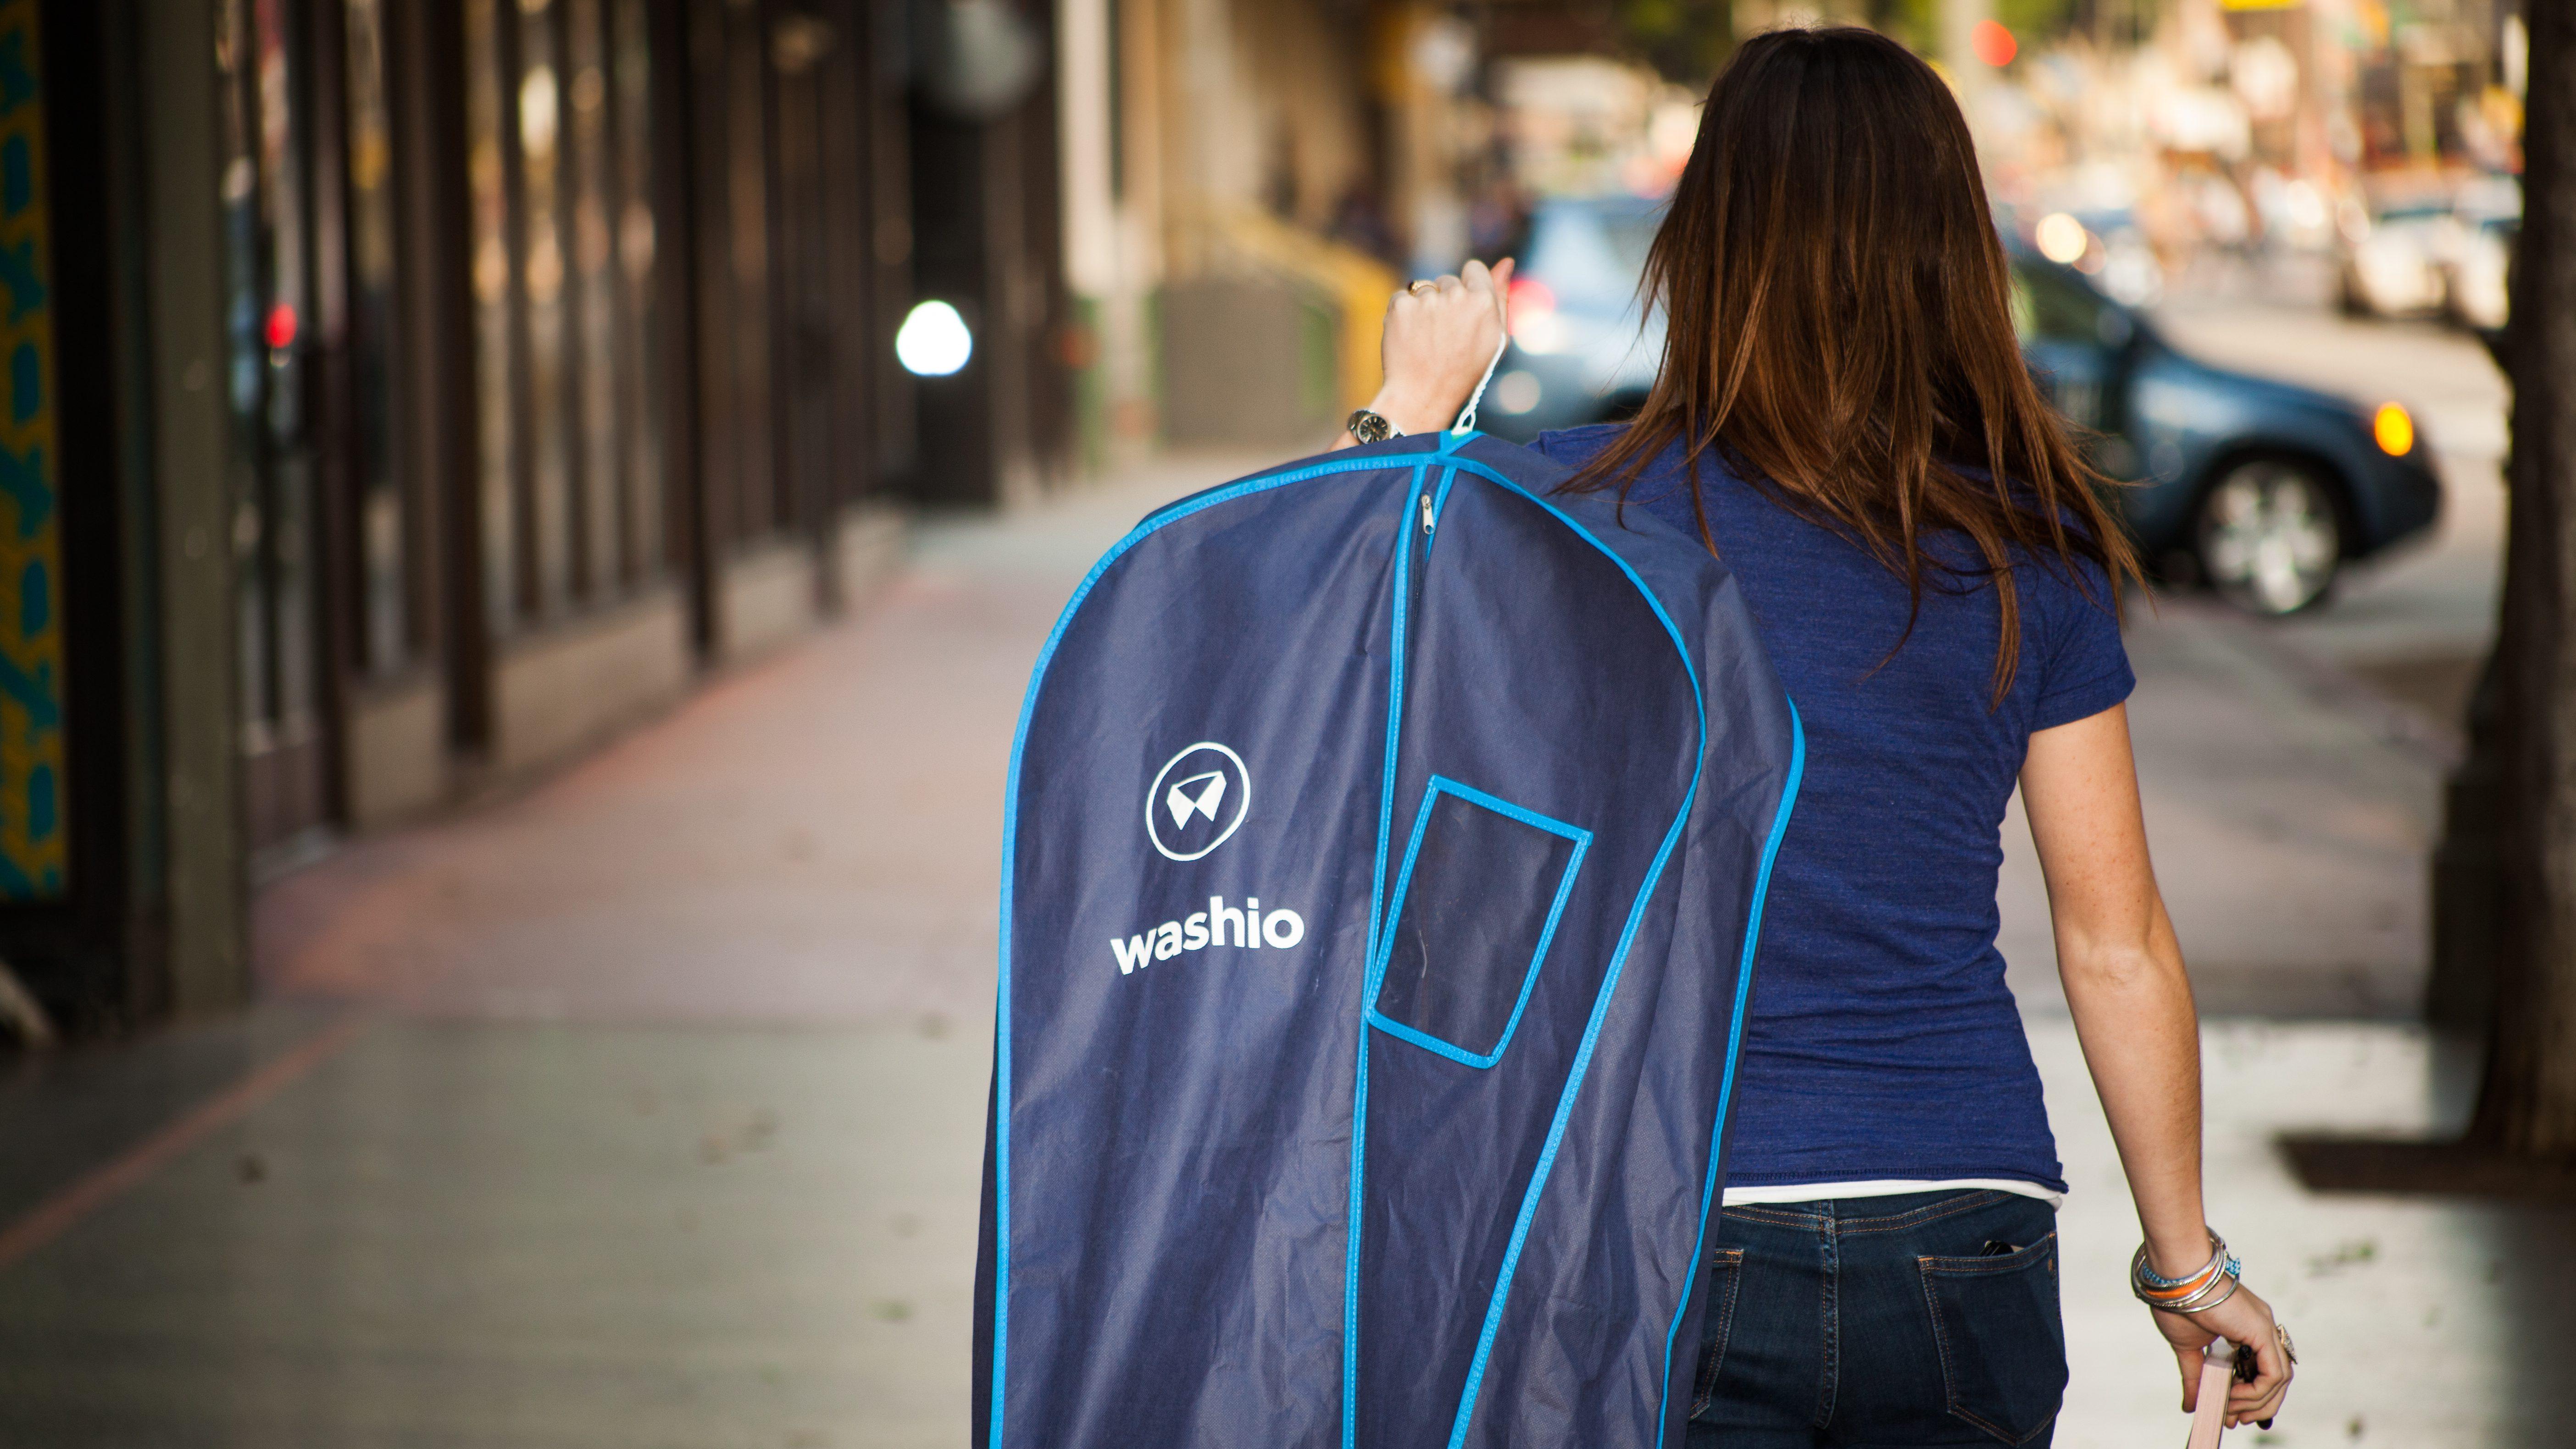 A Washio ninja carries some clothing.